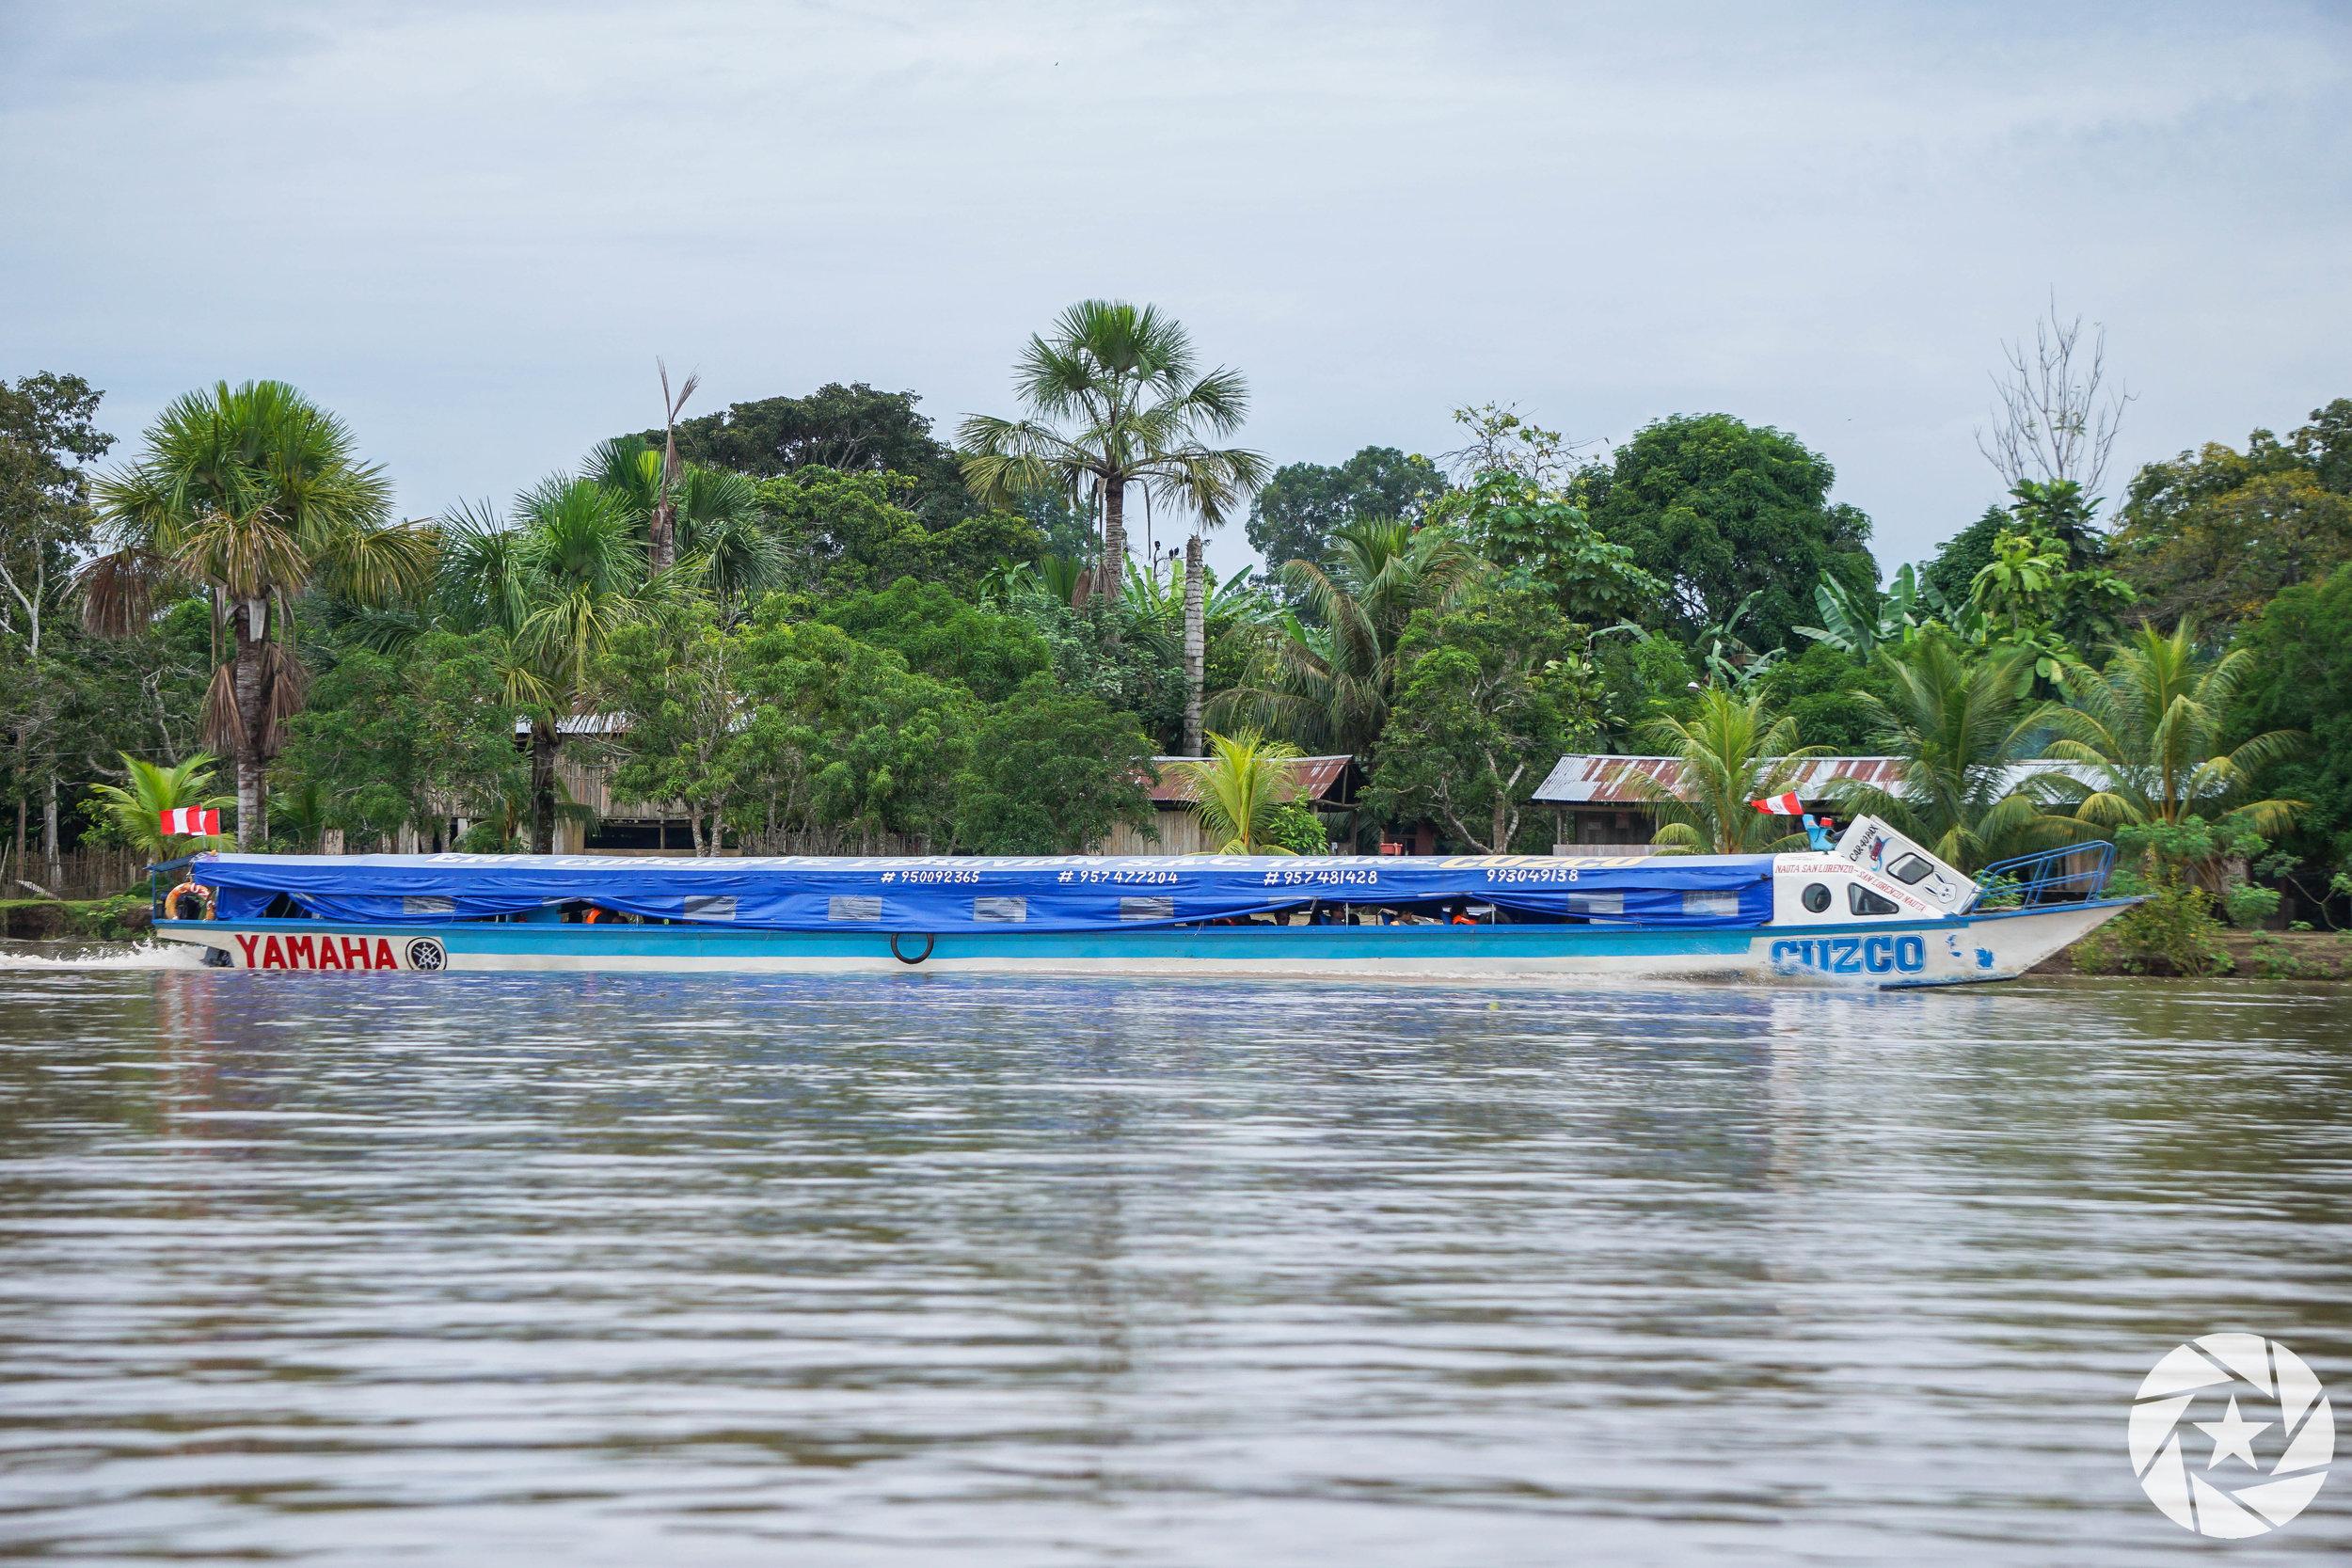 Speedboat Cruise to Iquitos, Peru